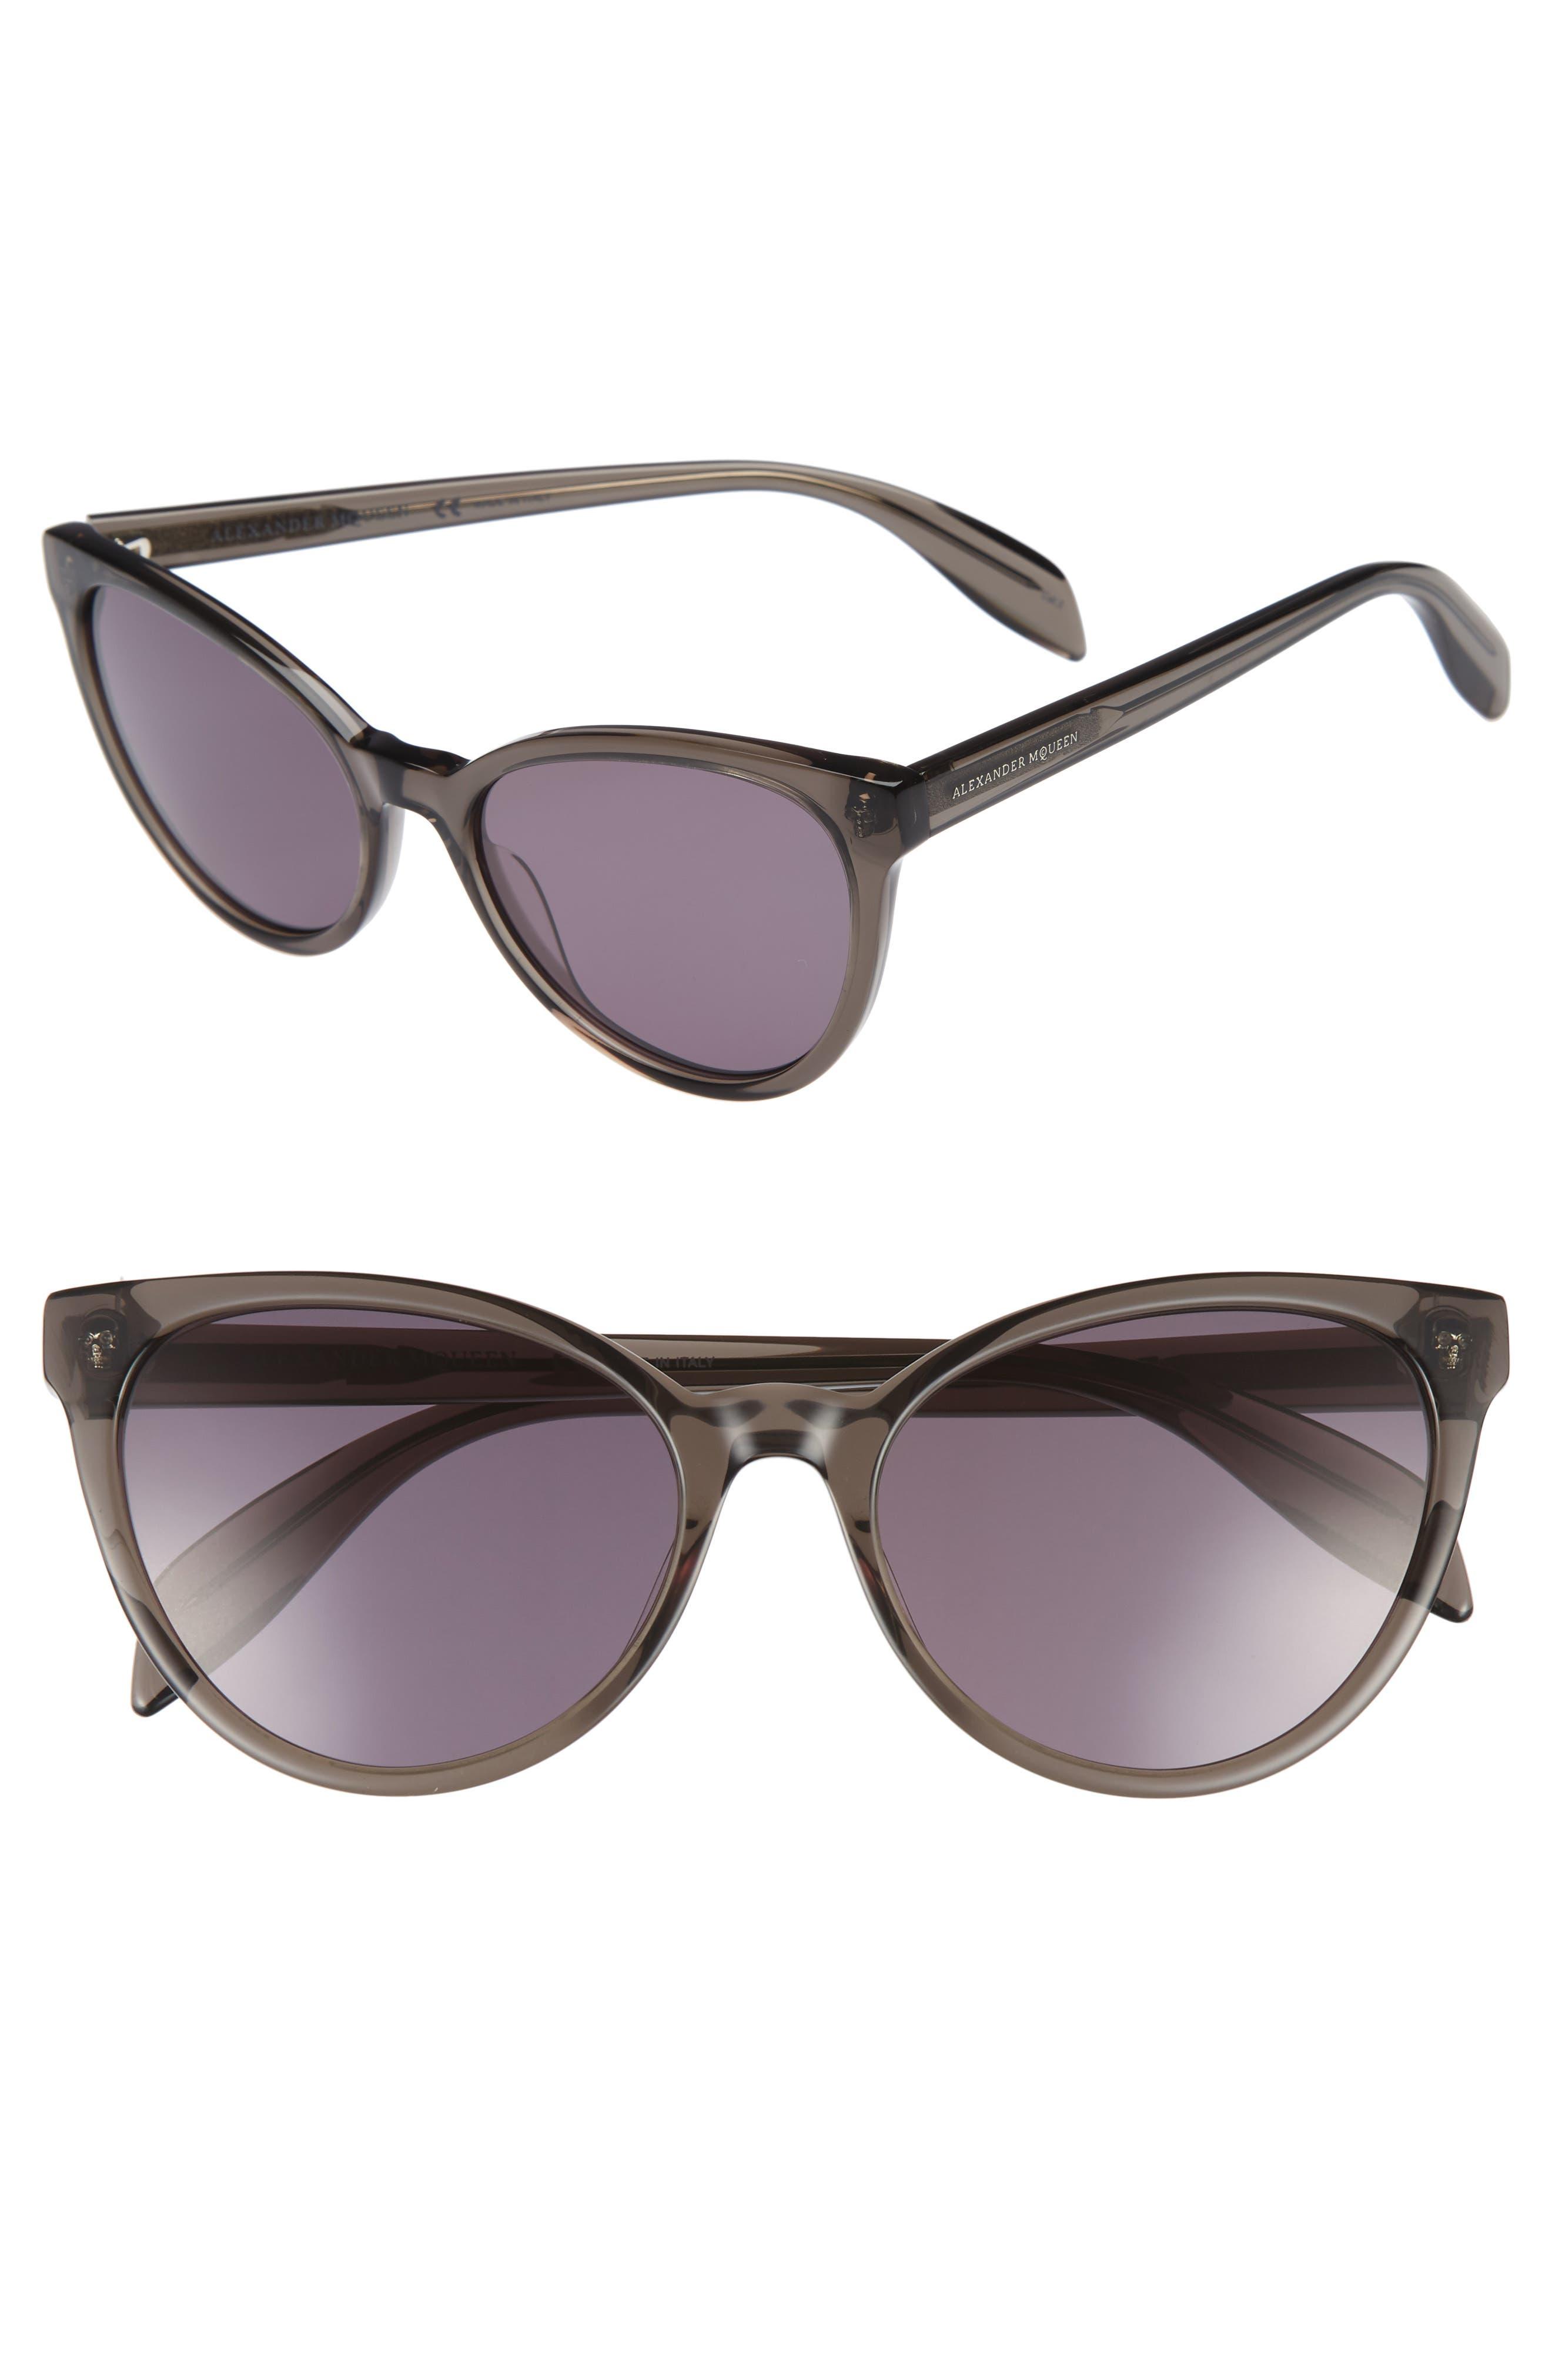 Main Image - Alexander McQueen 55mm Cat Eye Sunglasses